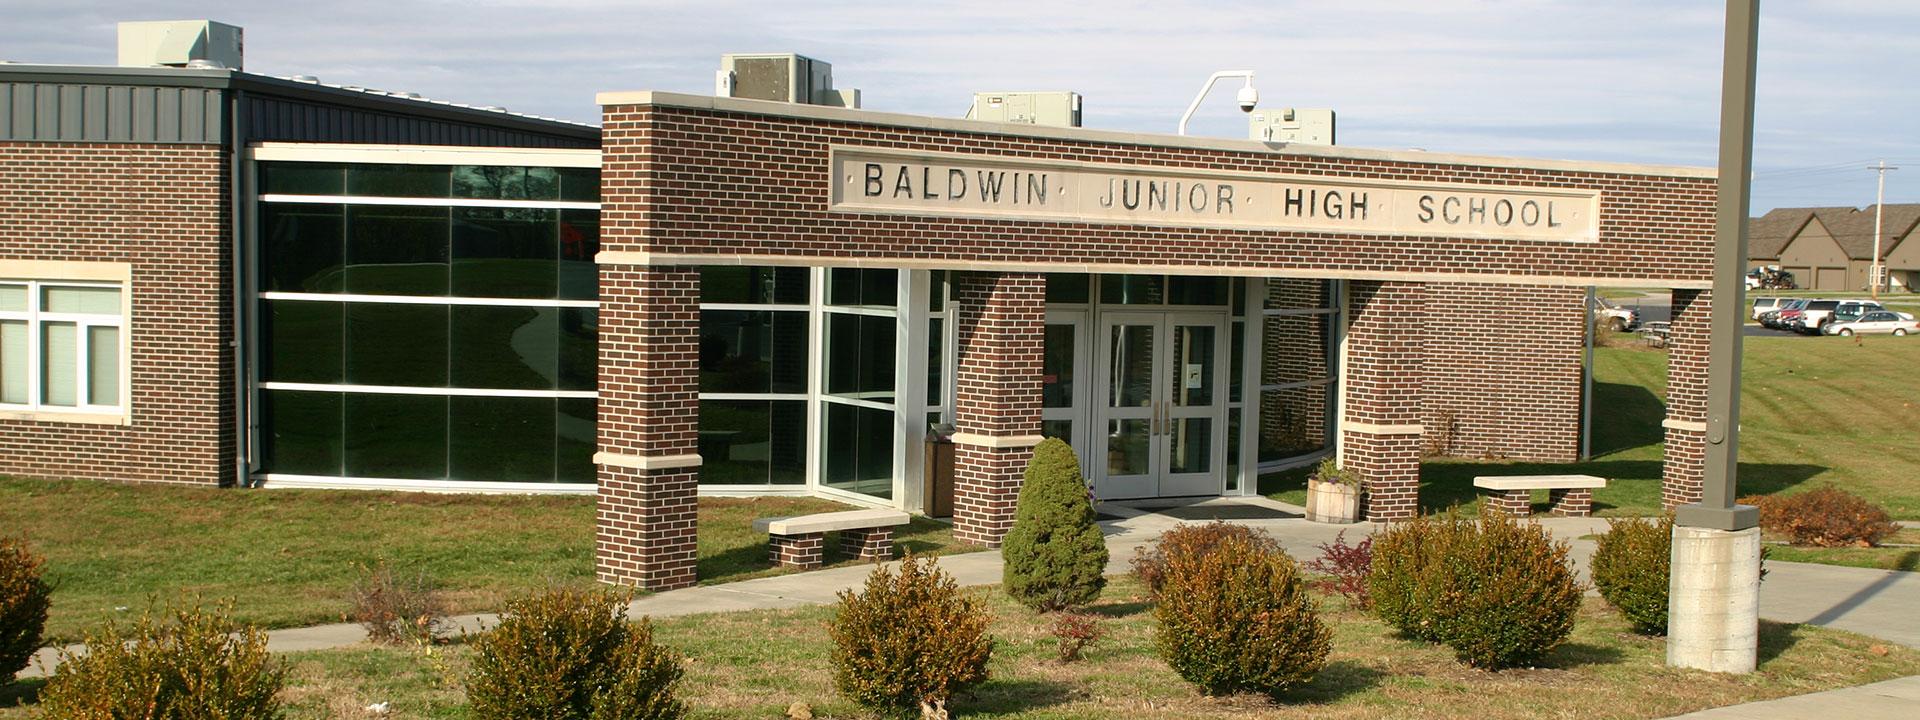 Photo of the Baldwin Junior HIgh School building exterior